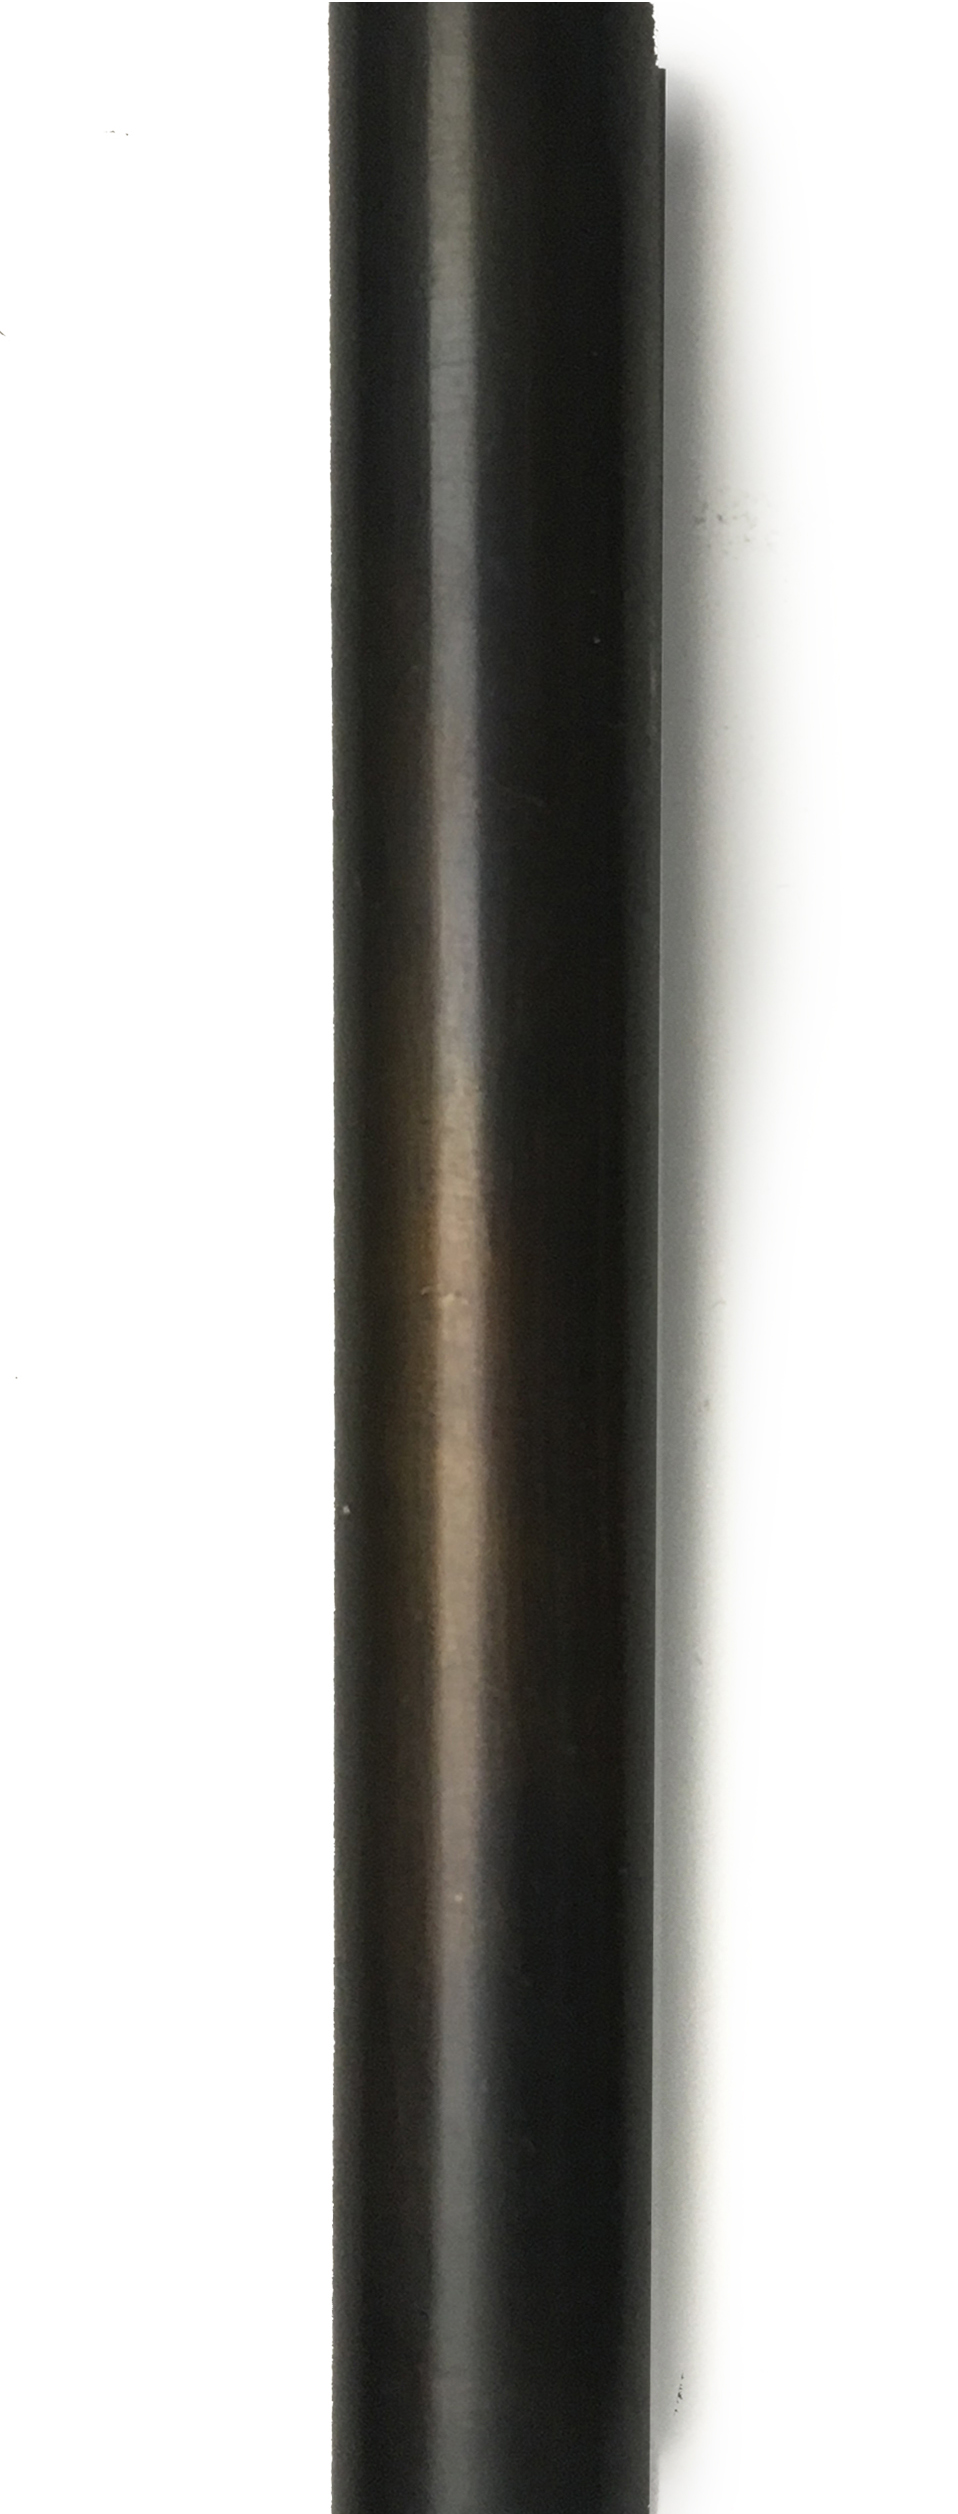 Copy of ORB-3